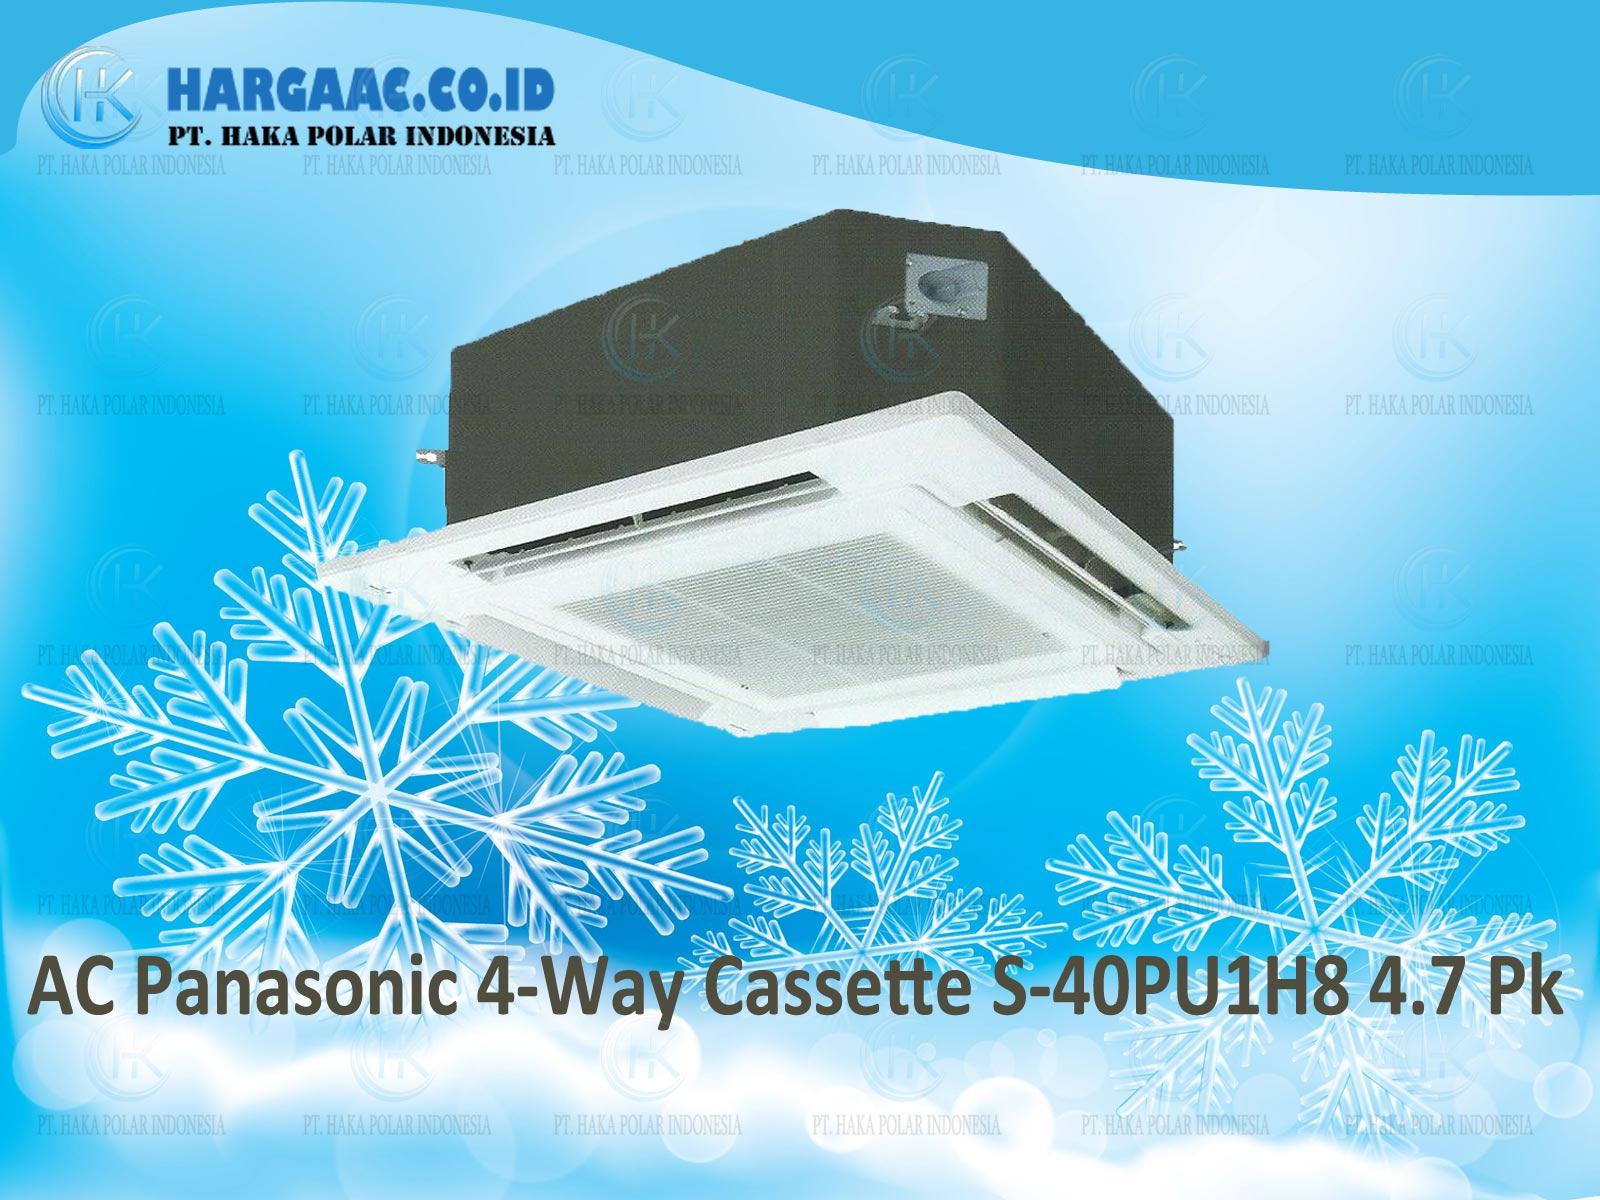 AC Panasonic 4-Way Cassette S-40PU1H8 3 Phase 4.7 PK R410a